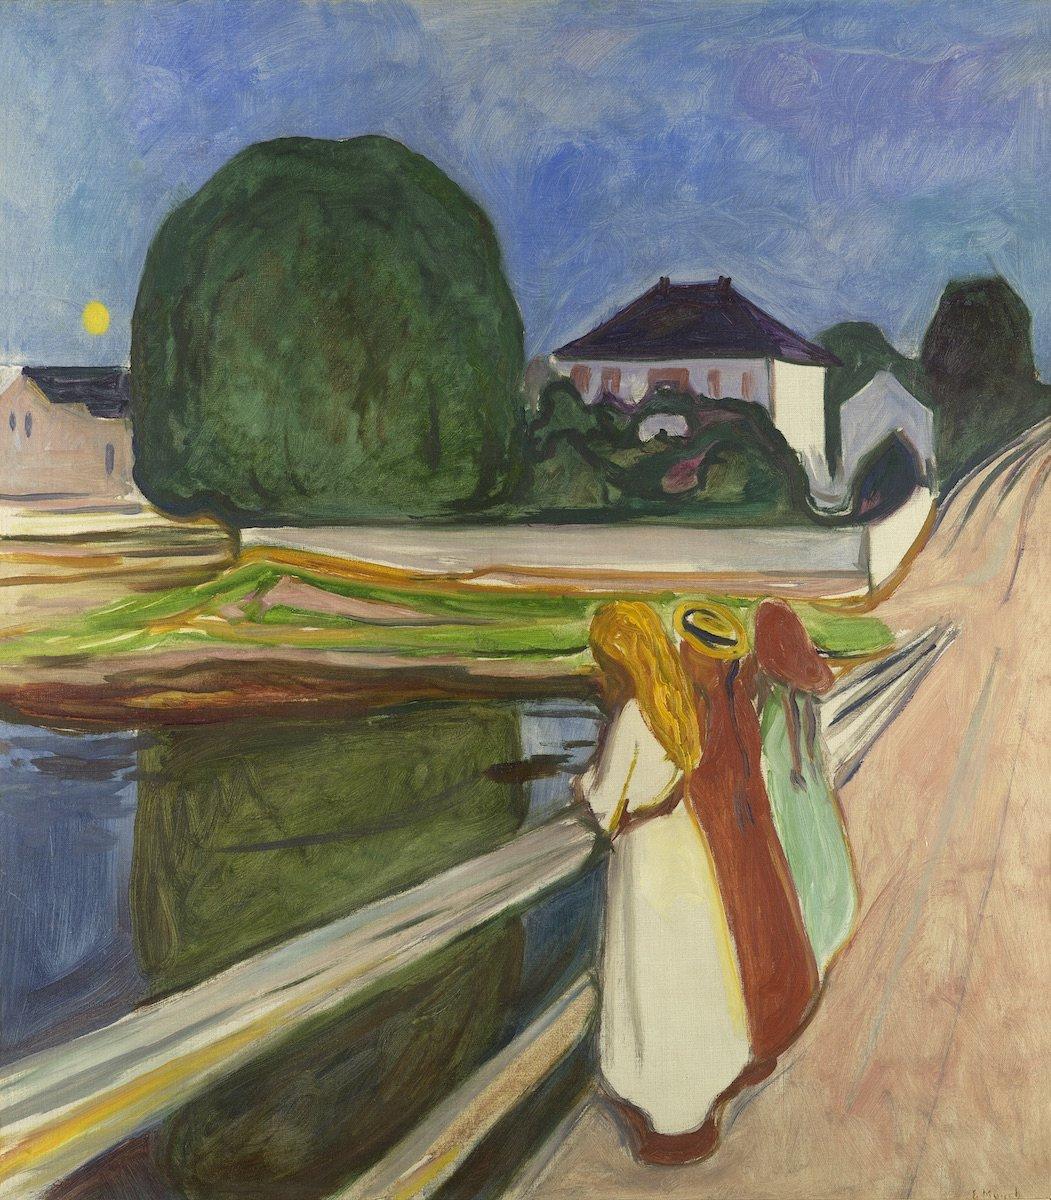 Edvard Munch. The girls on the bridge